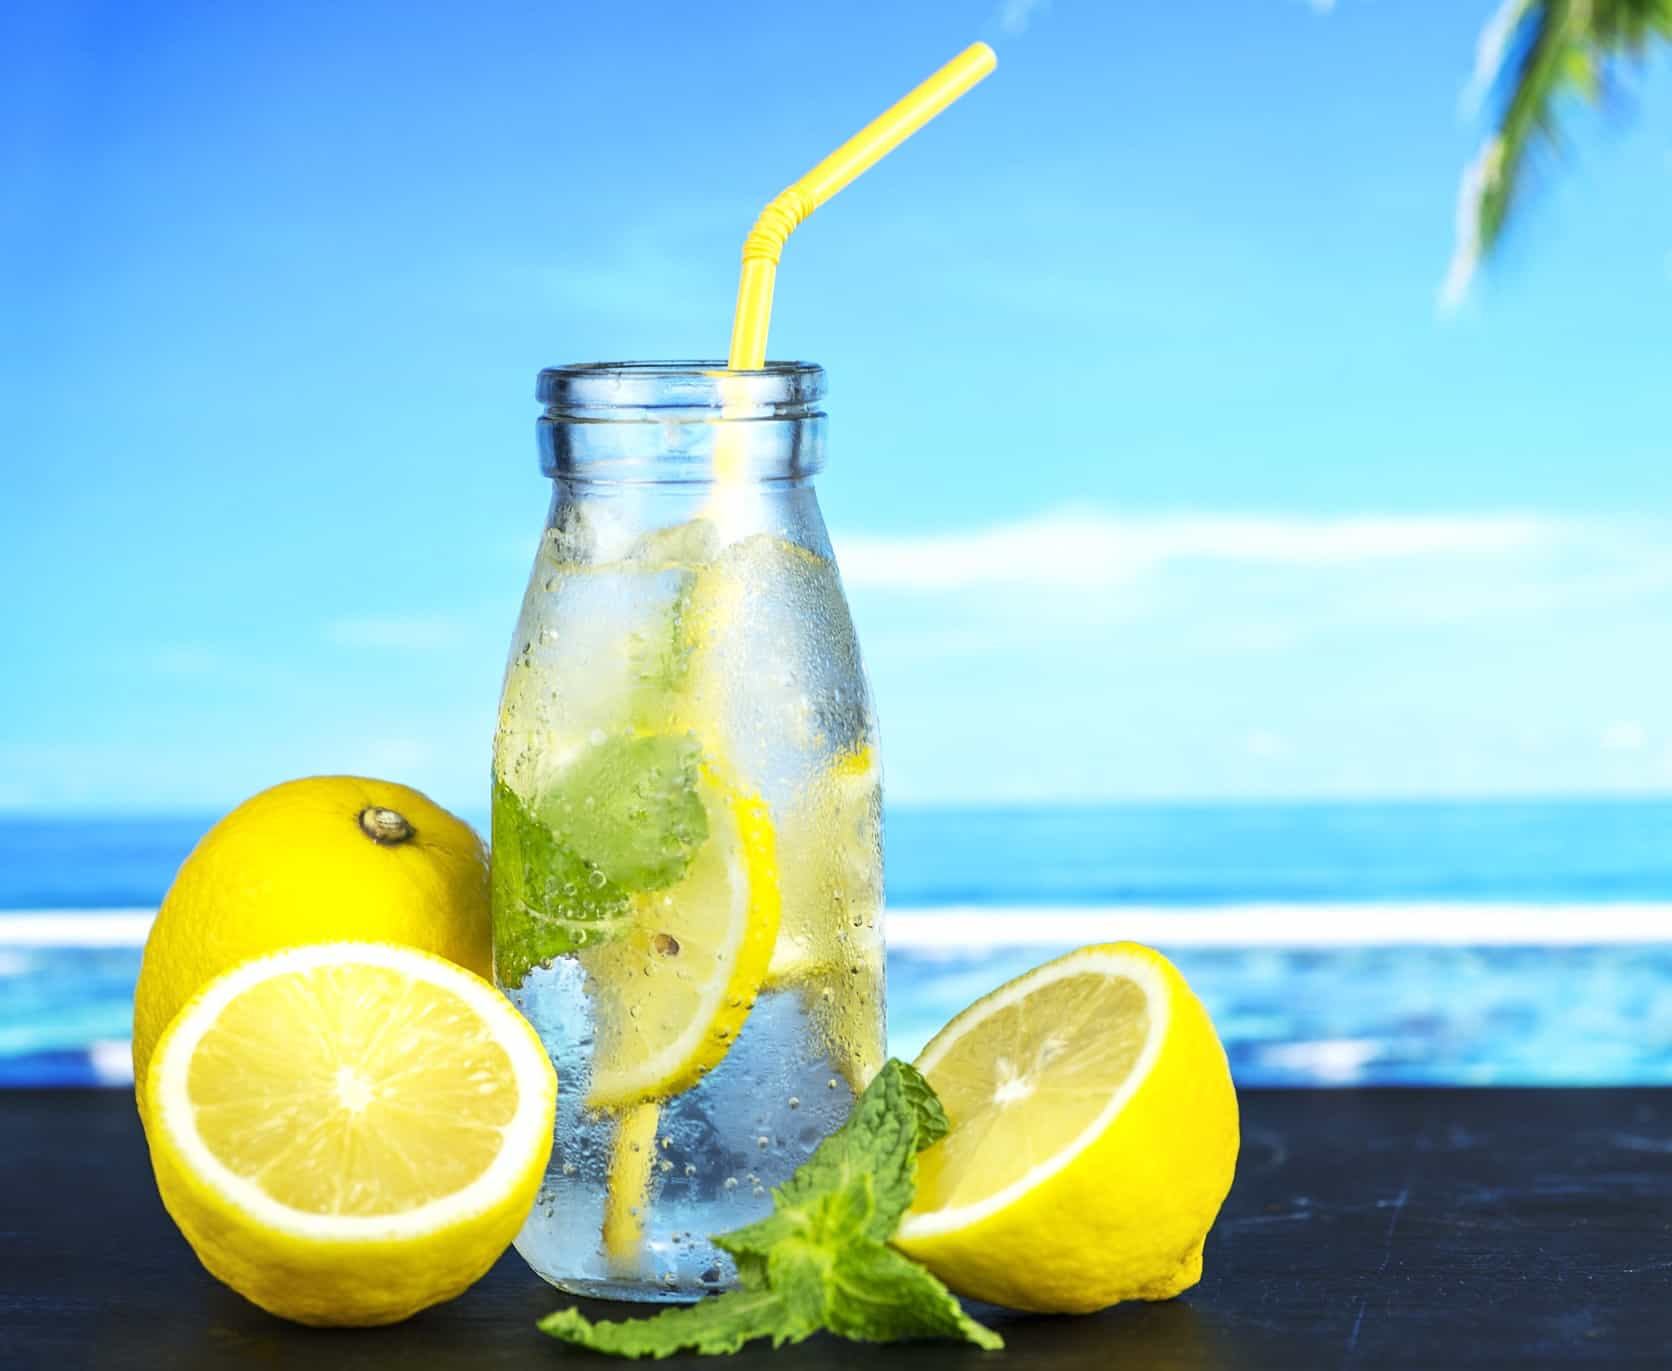 lemons in water with straw ocean in background